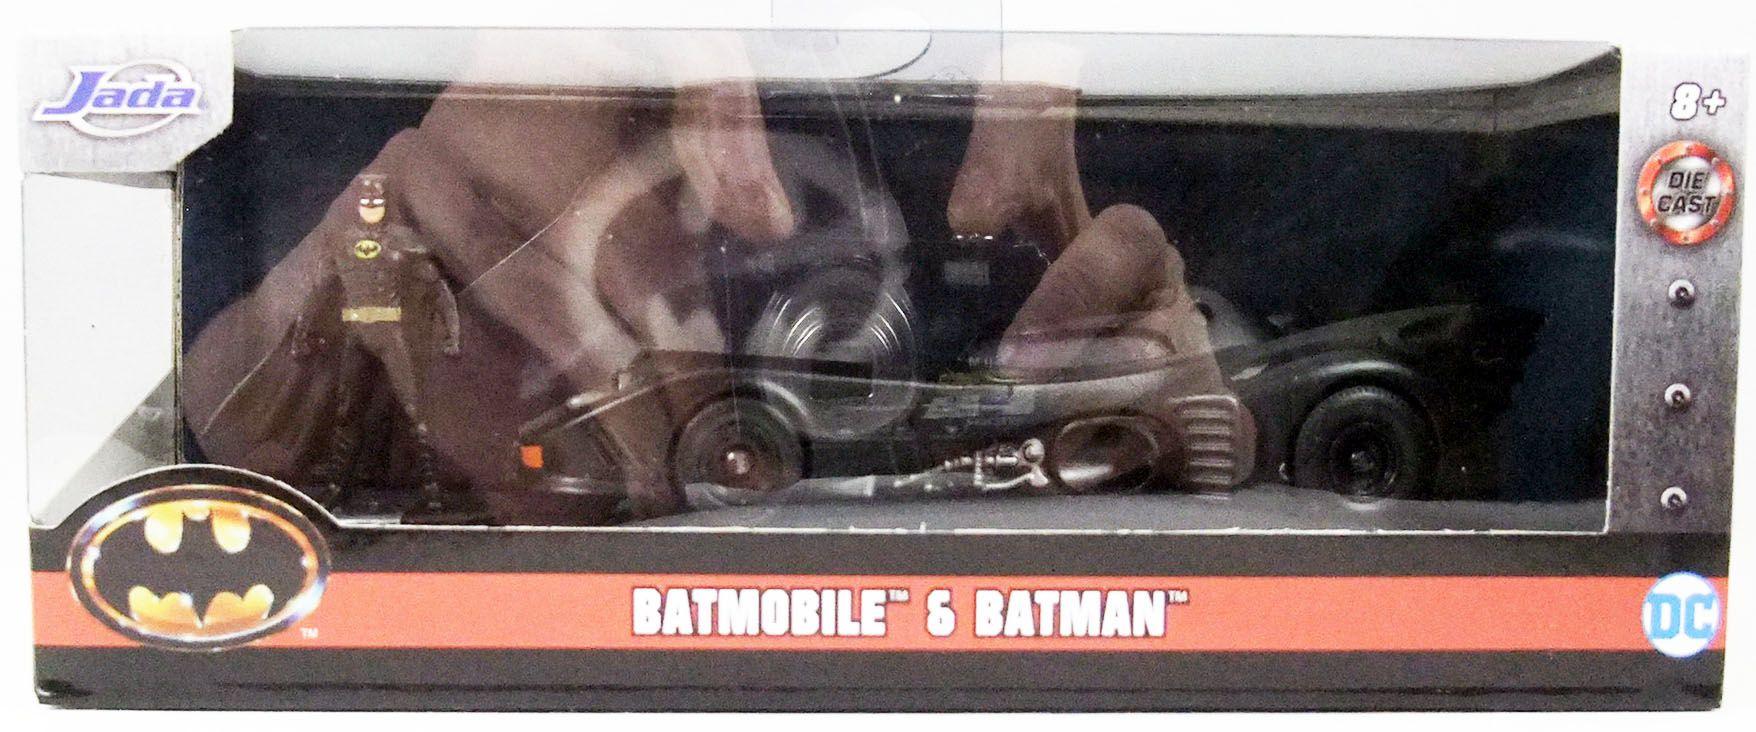 Batman (1989 Movie) - Jada - 1:32 scale die-cast Batmobile with Batman figure